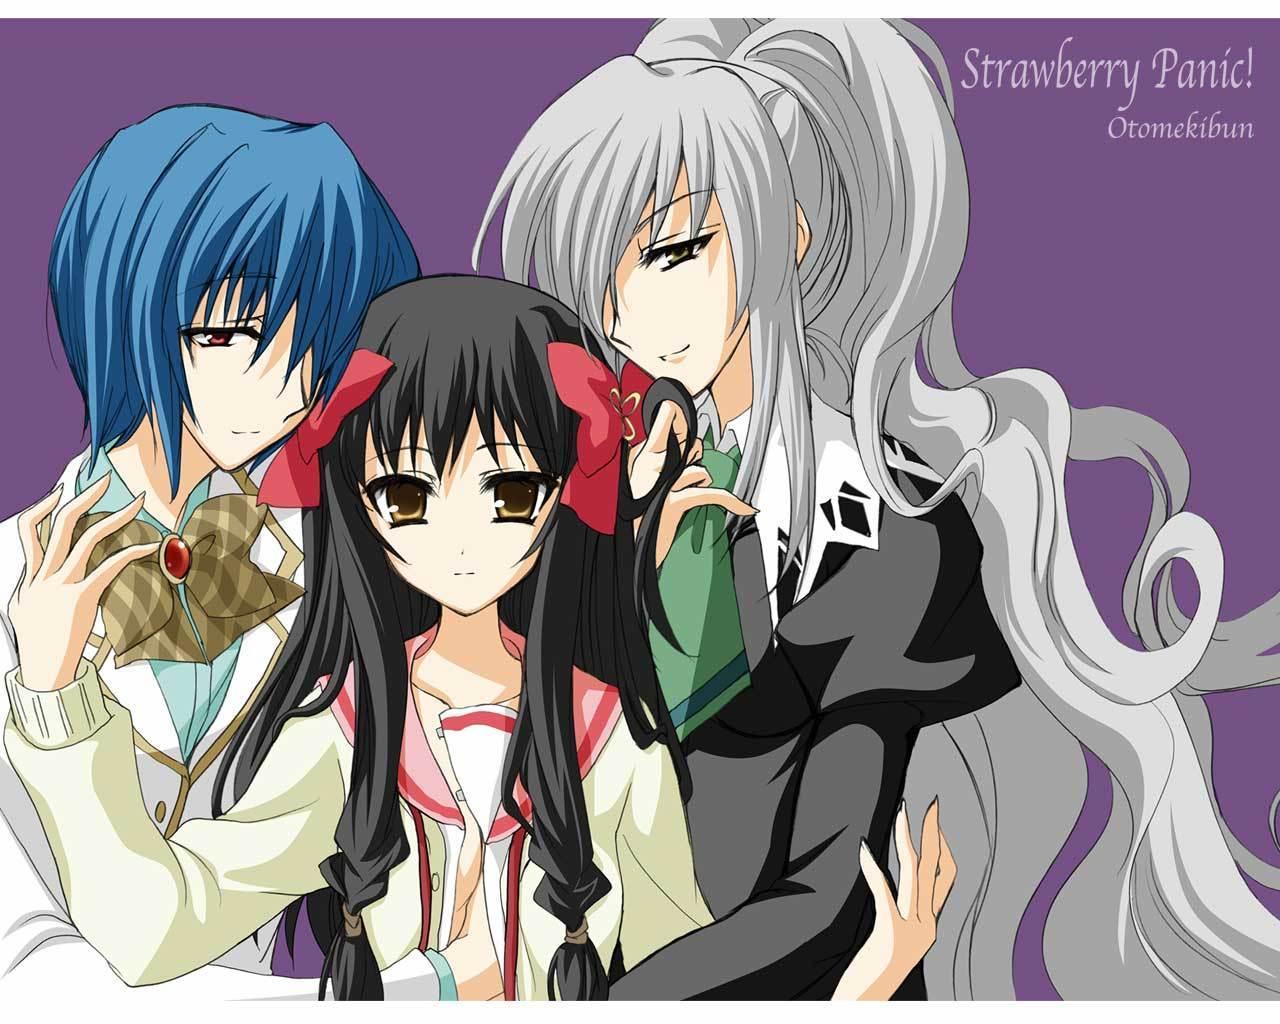 Anime Manga Wallpaper Strawberry Panic Images